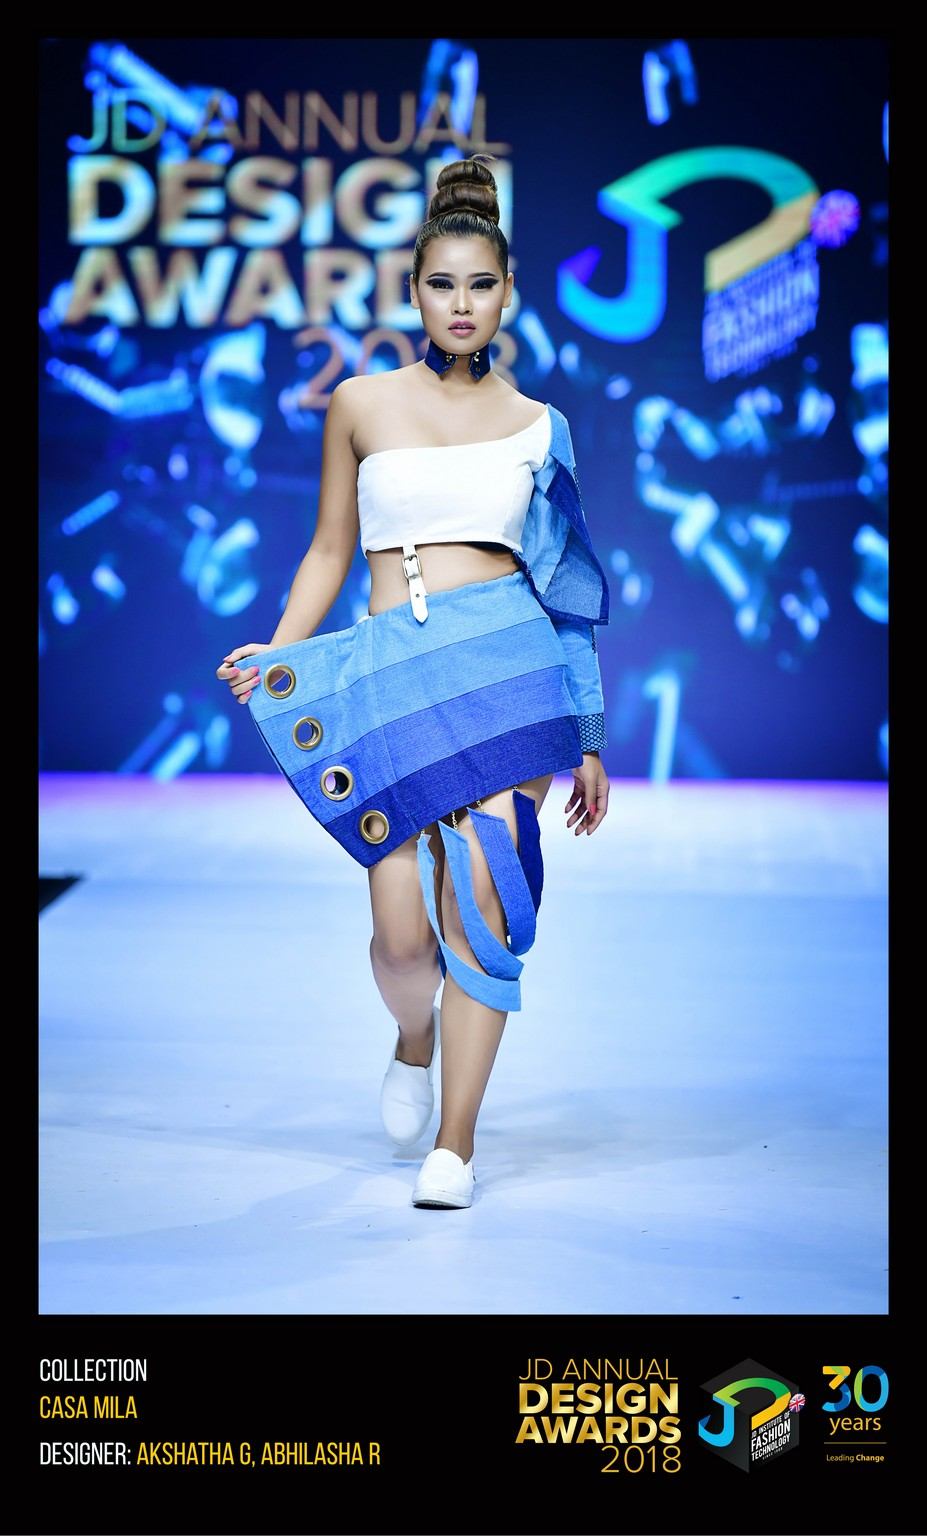 Casa Mila – Change – JD Annual Design Awards 2018 | Designer: Akshata, Sapna and Abhilasha | Photography : Jerin Nath (@jerin_nath) casa mila – change – jd annual design awards 2018 Casa Mila – Change – JD Annual Design Awards 2018 CASA MILA 4